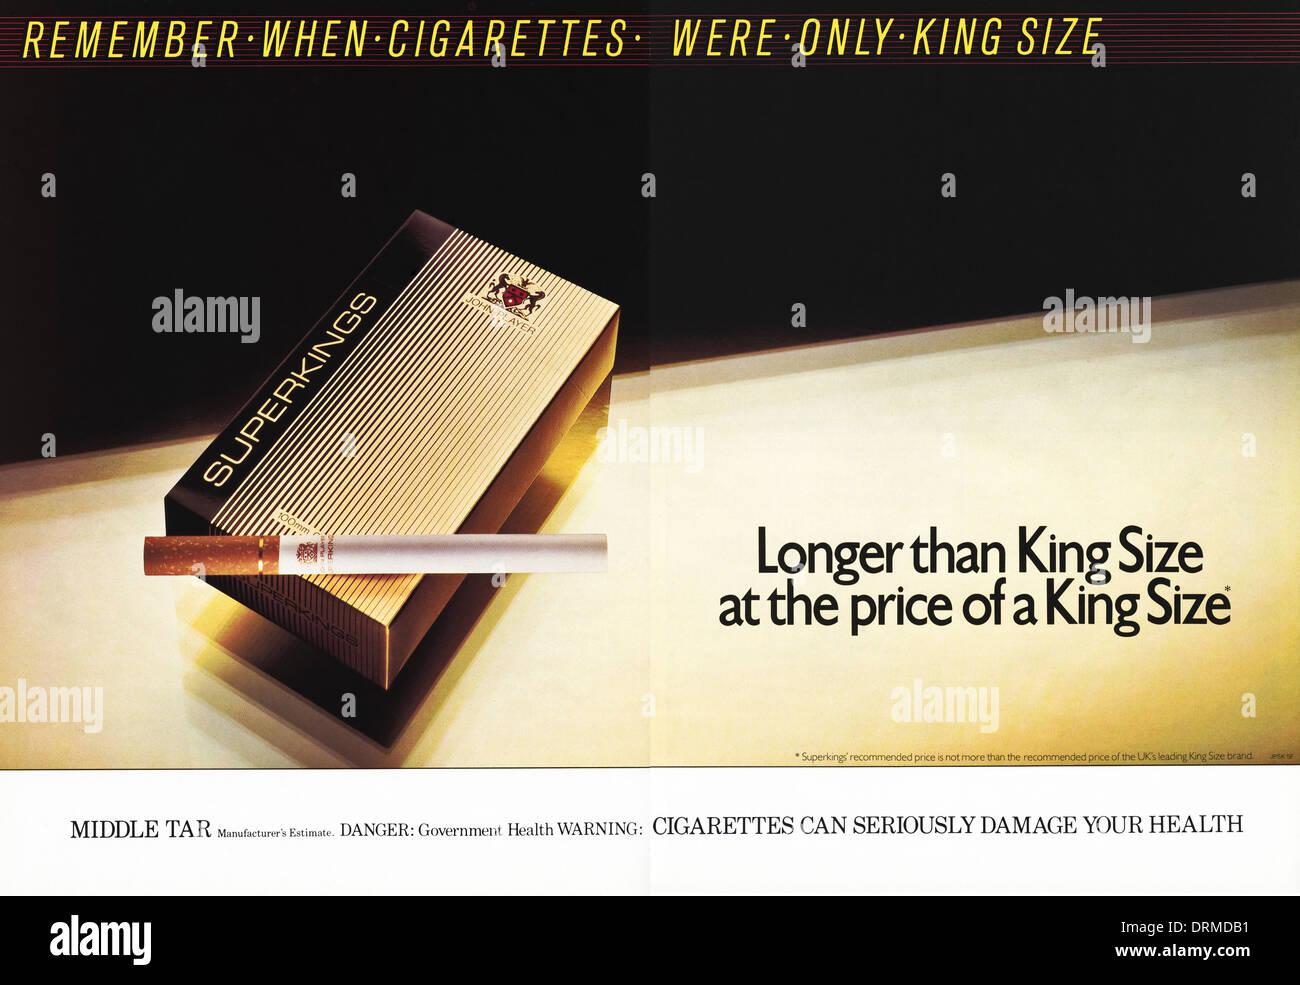 Marlboro southern cut cigarettes nicotine